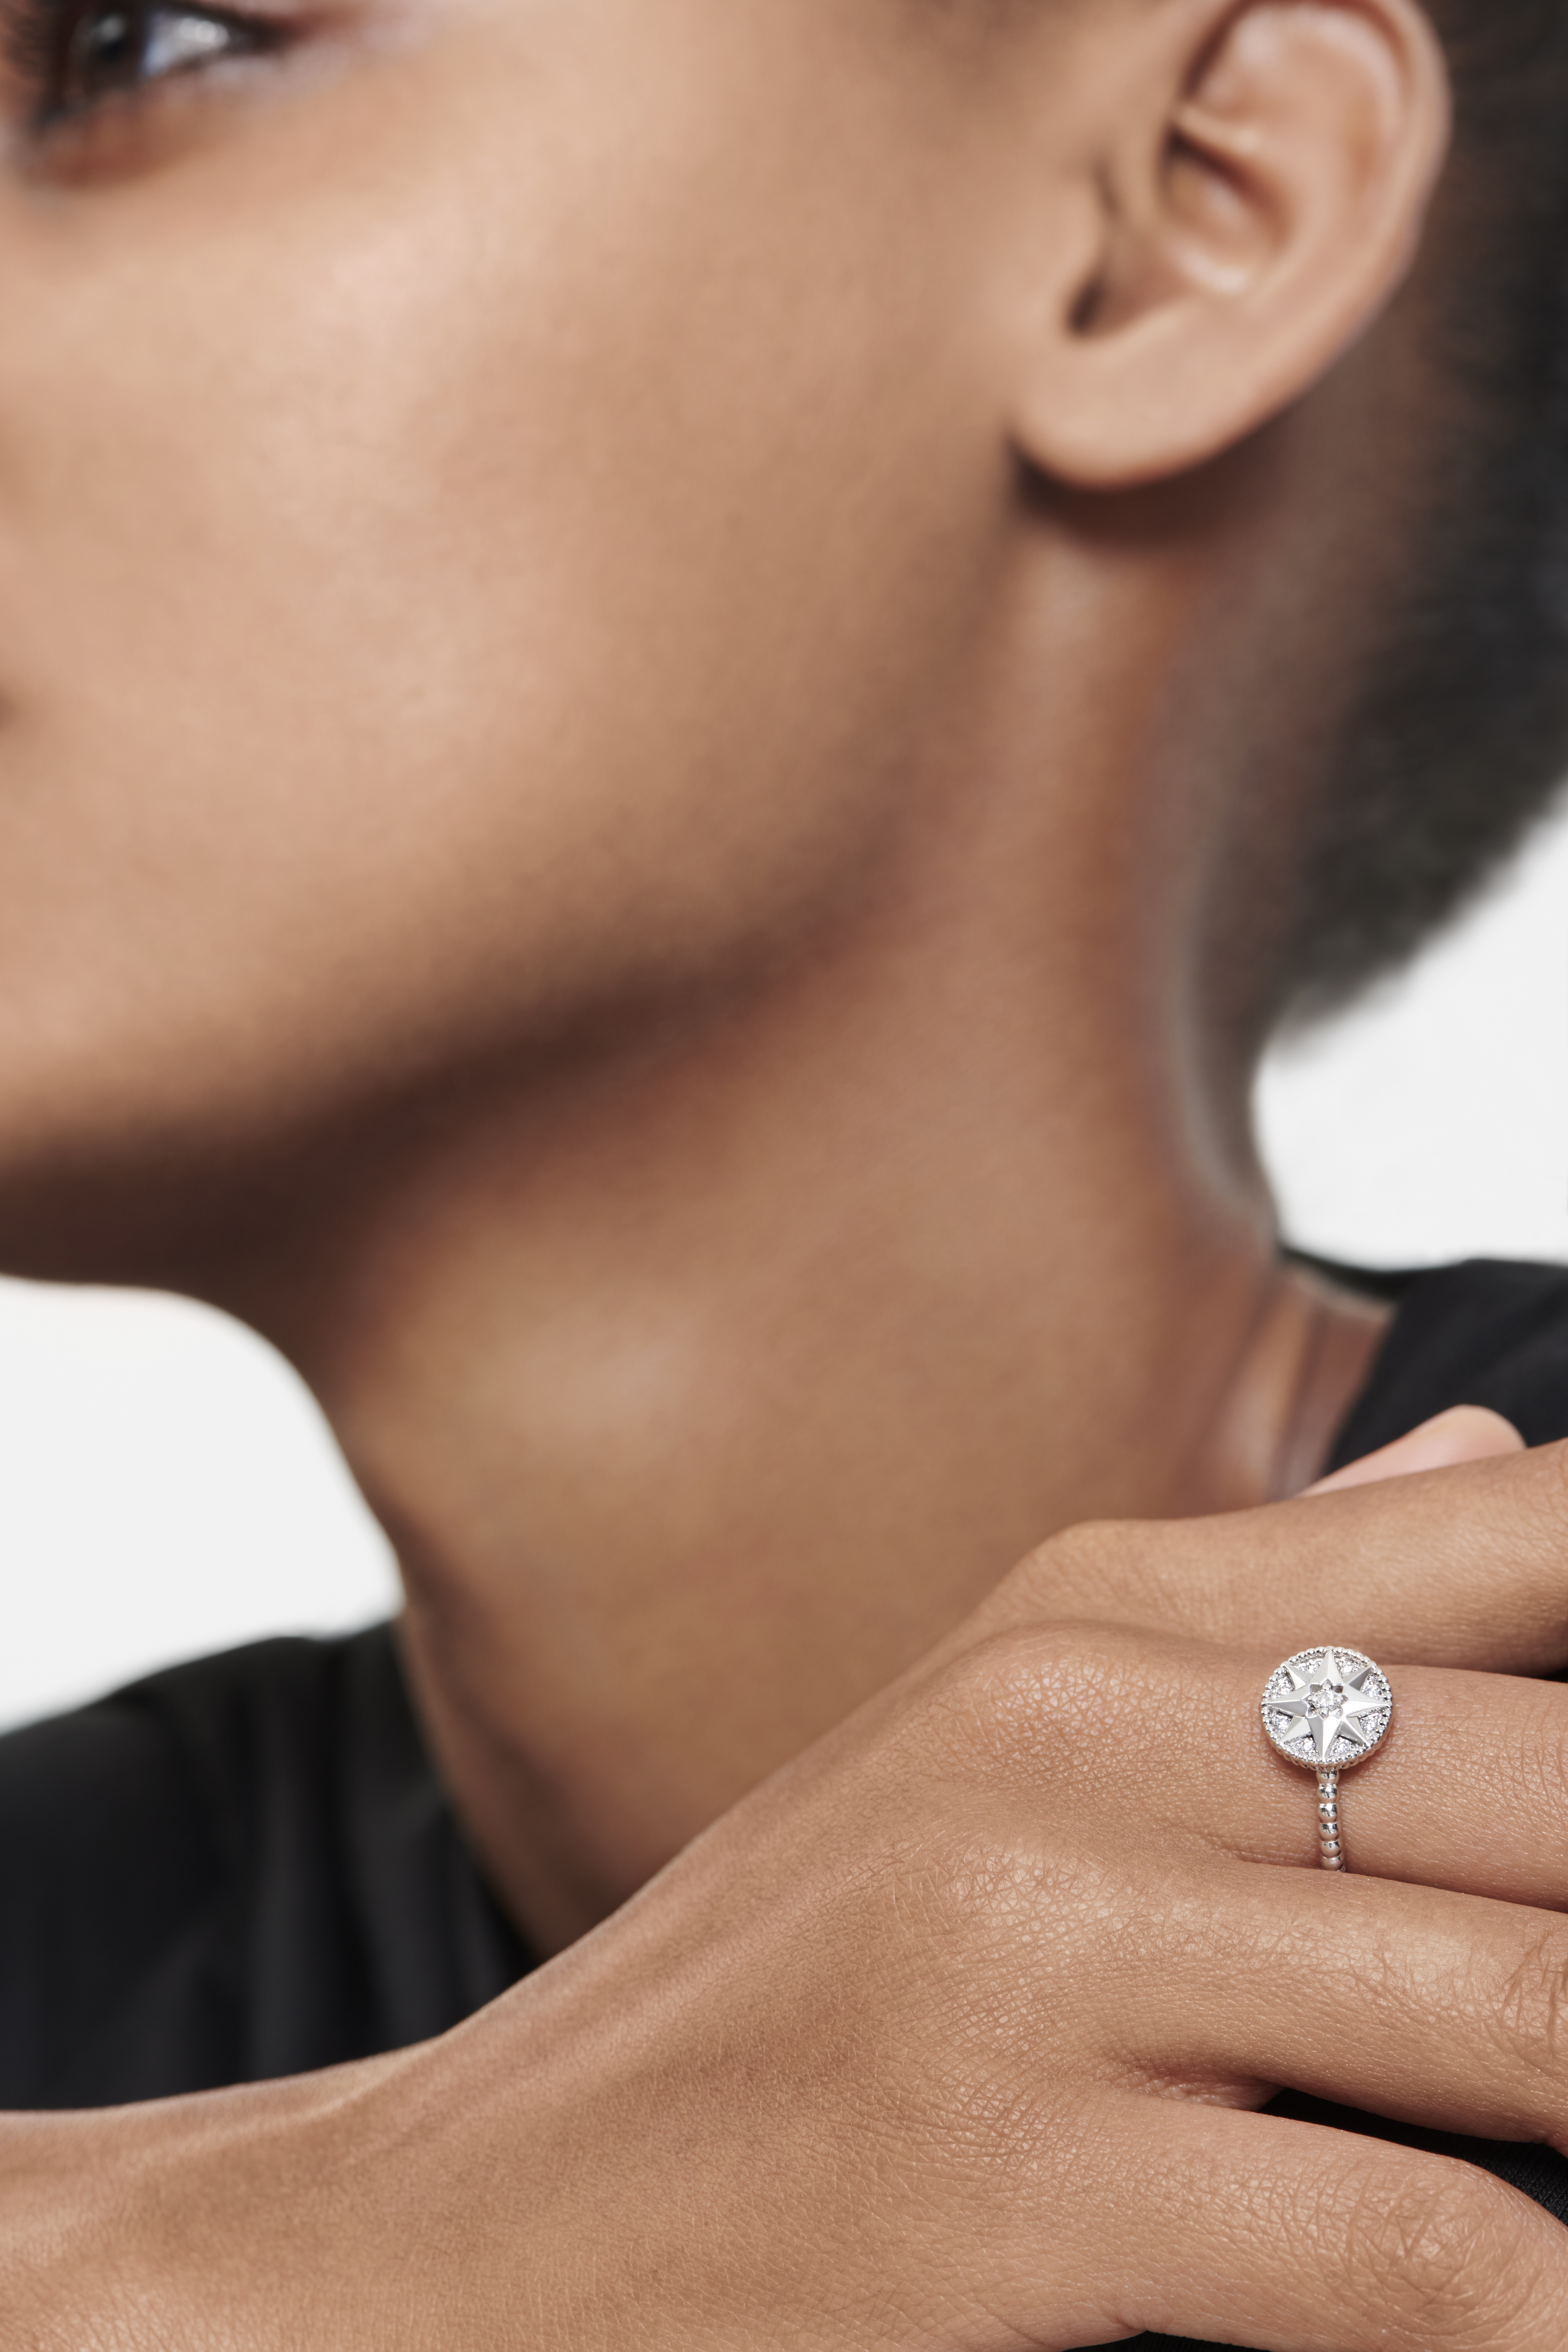 ديور Dior تطلق مجموعة Rose Des Vents  الجديدة